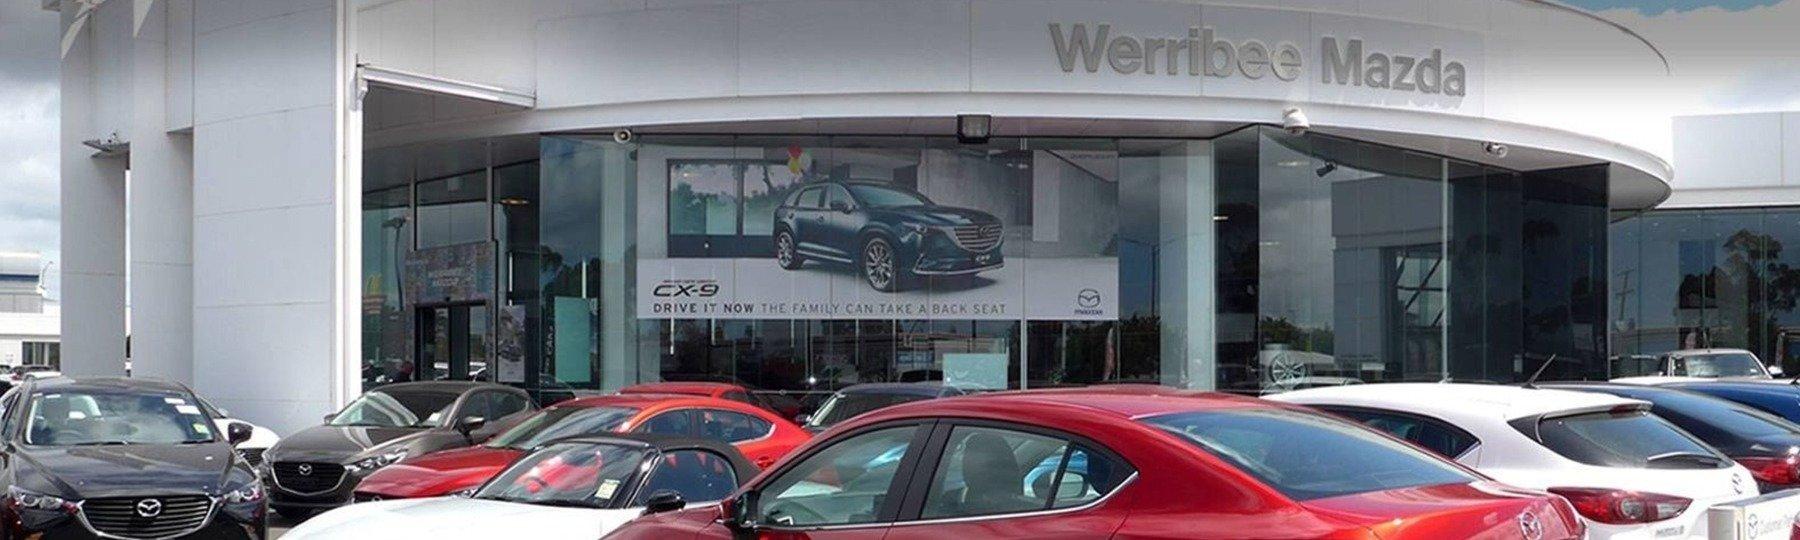 Werribee Mazda